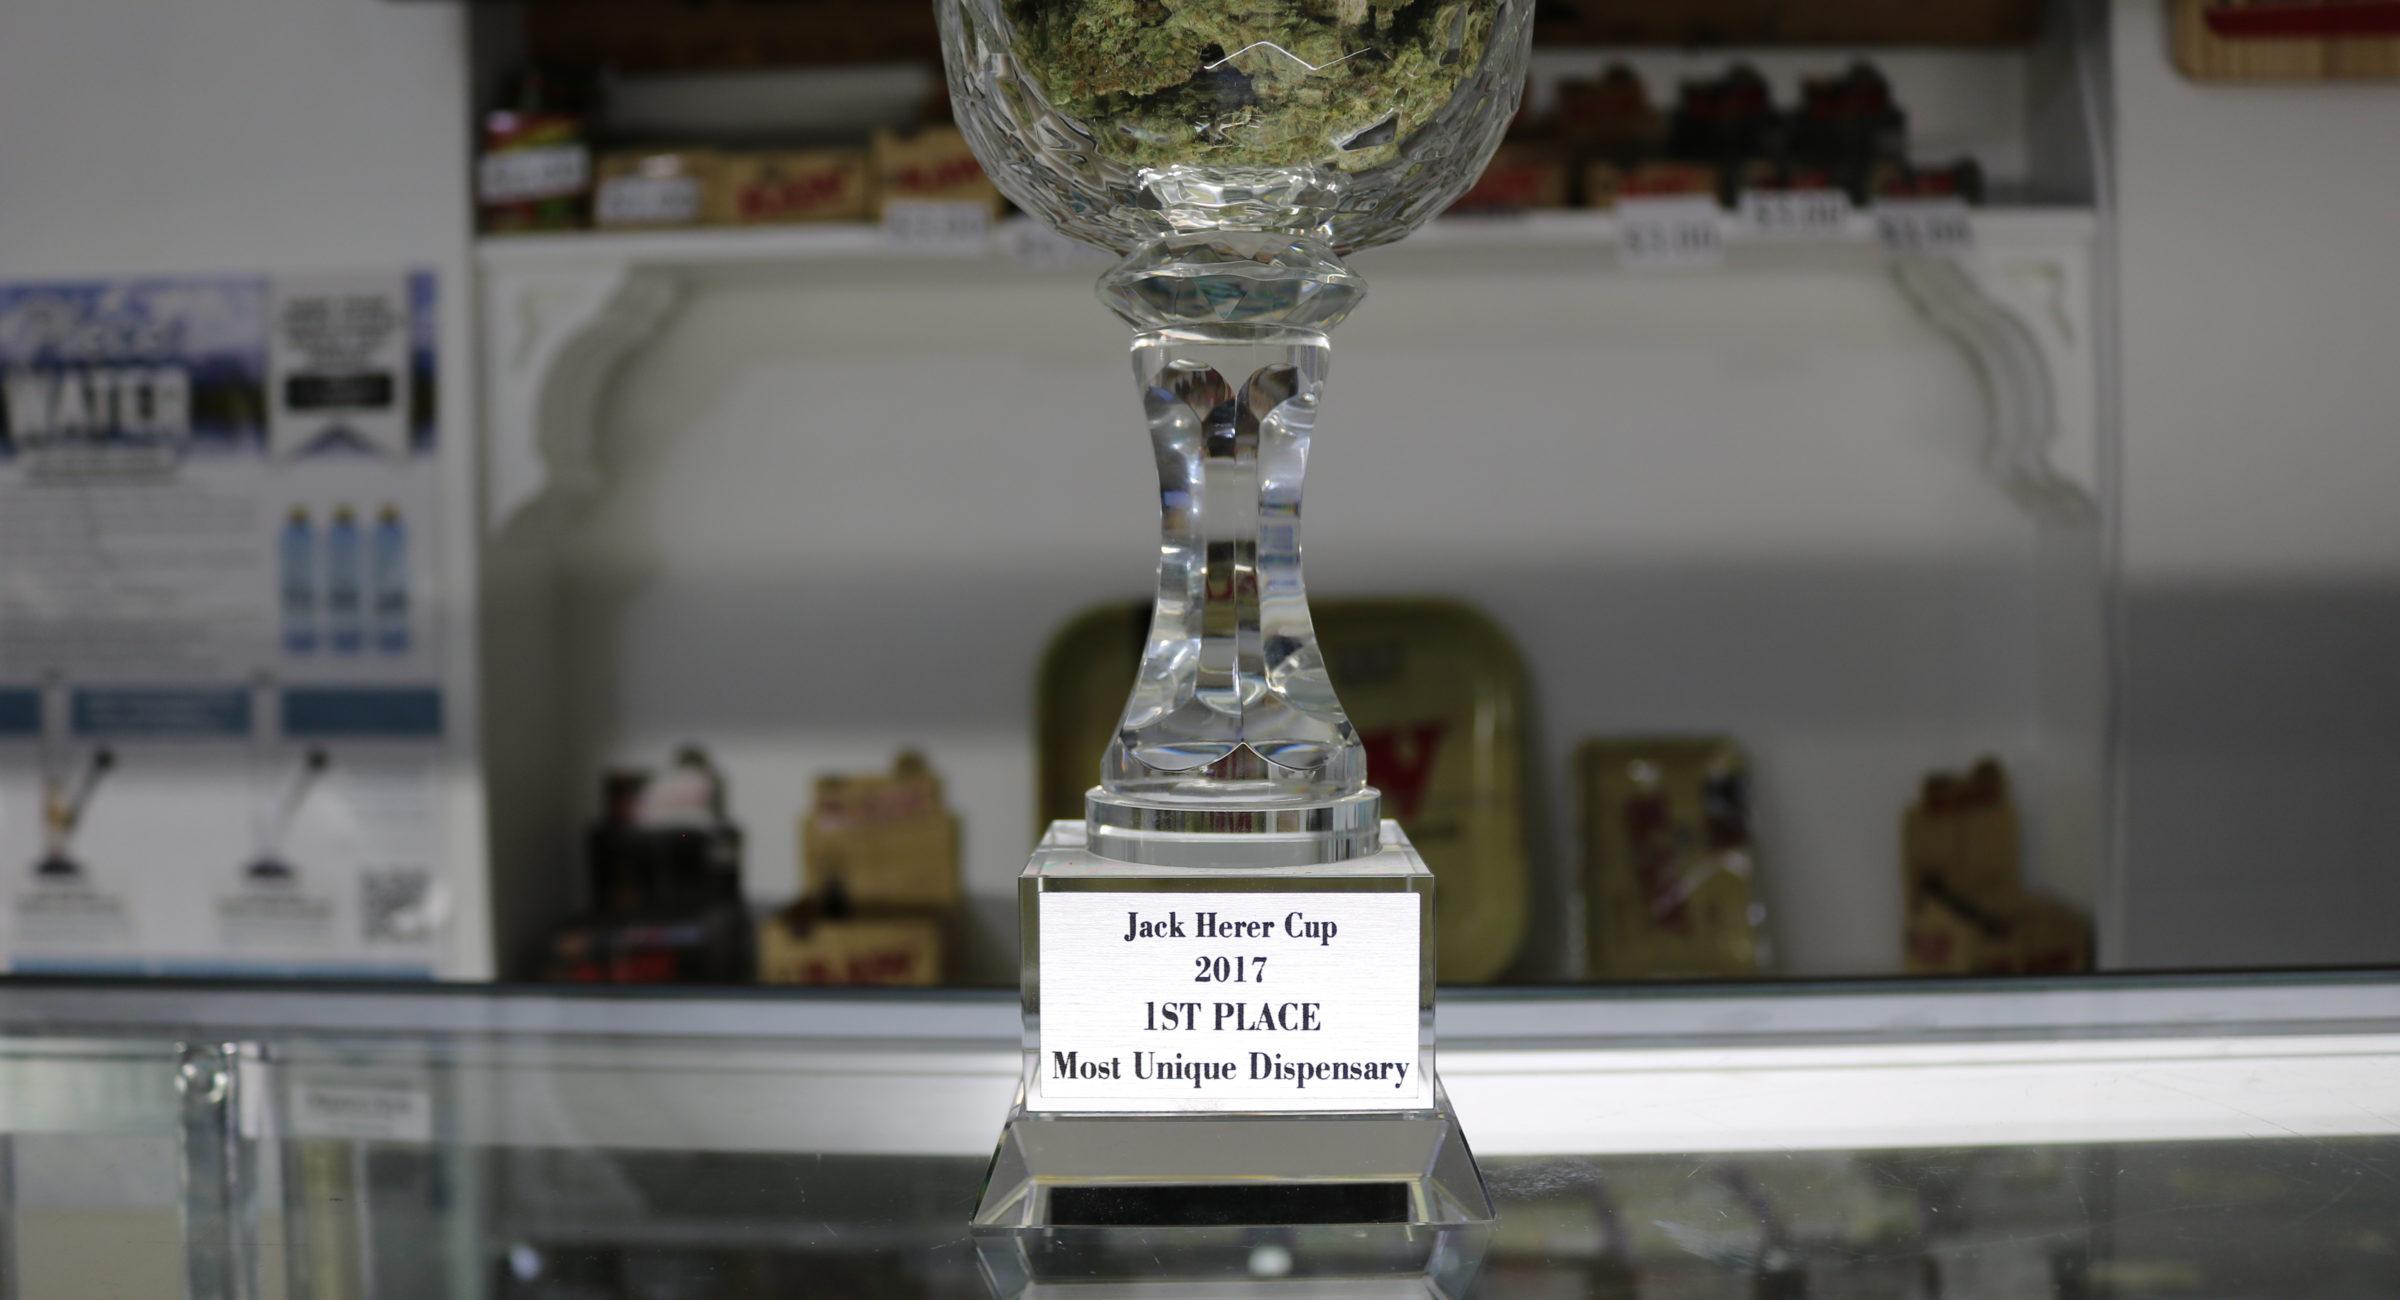 jack herer cup trophy winners